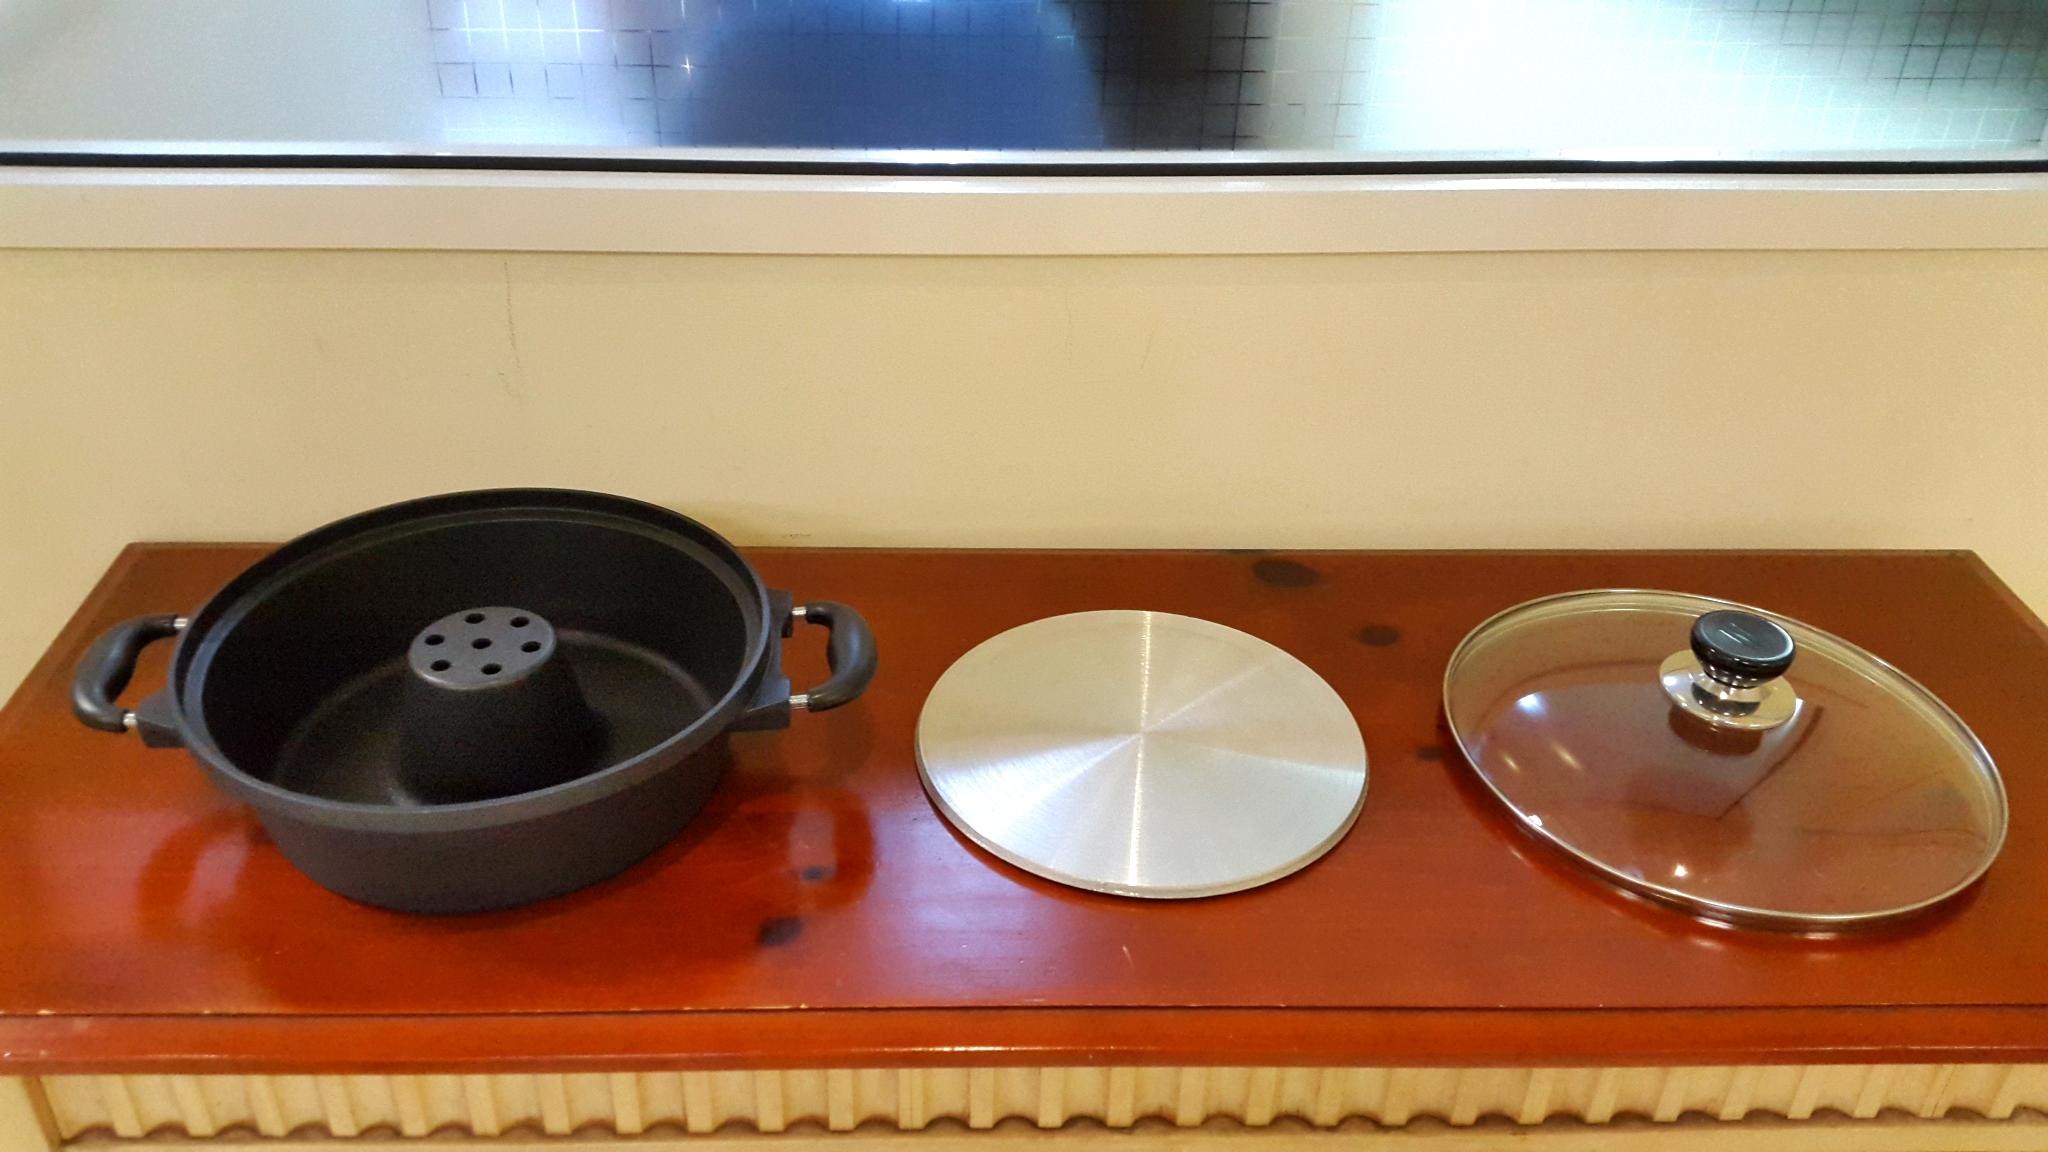 Baking Pan Cetakan Kue Bolu Murah Berkualitas Teflon Anti